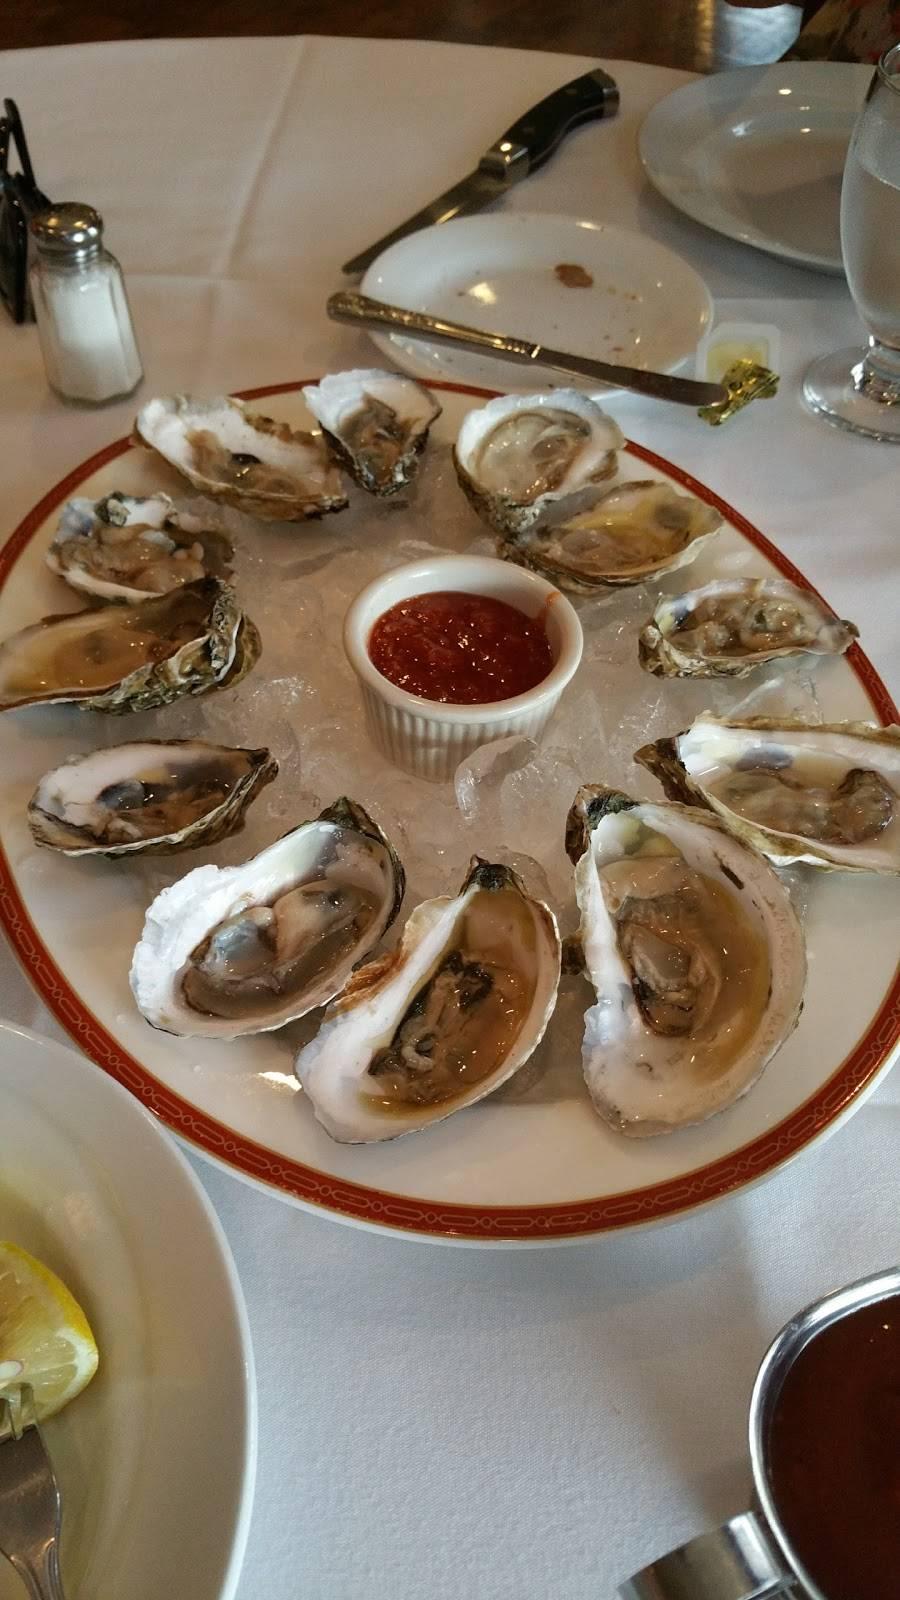 Cliffs Steakhouse | restaurant | 18 Sylvan Ave, Englewood Cliffs, NJ 07632, USA | 2019440233 OR +1 201-944-0233